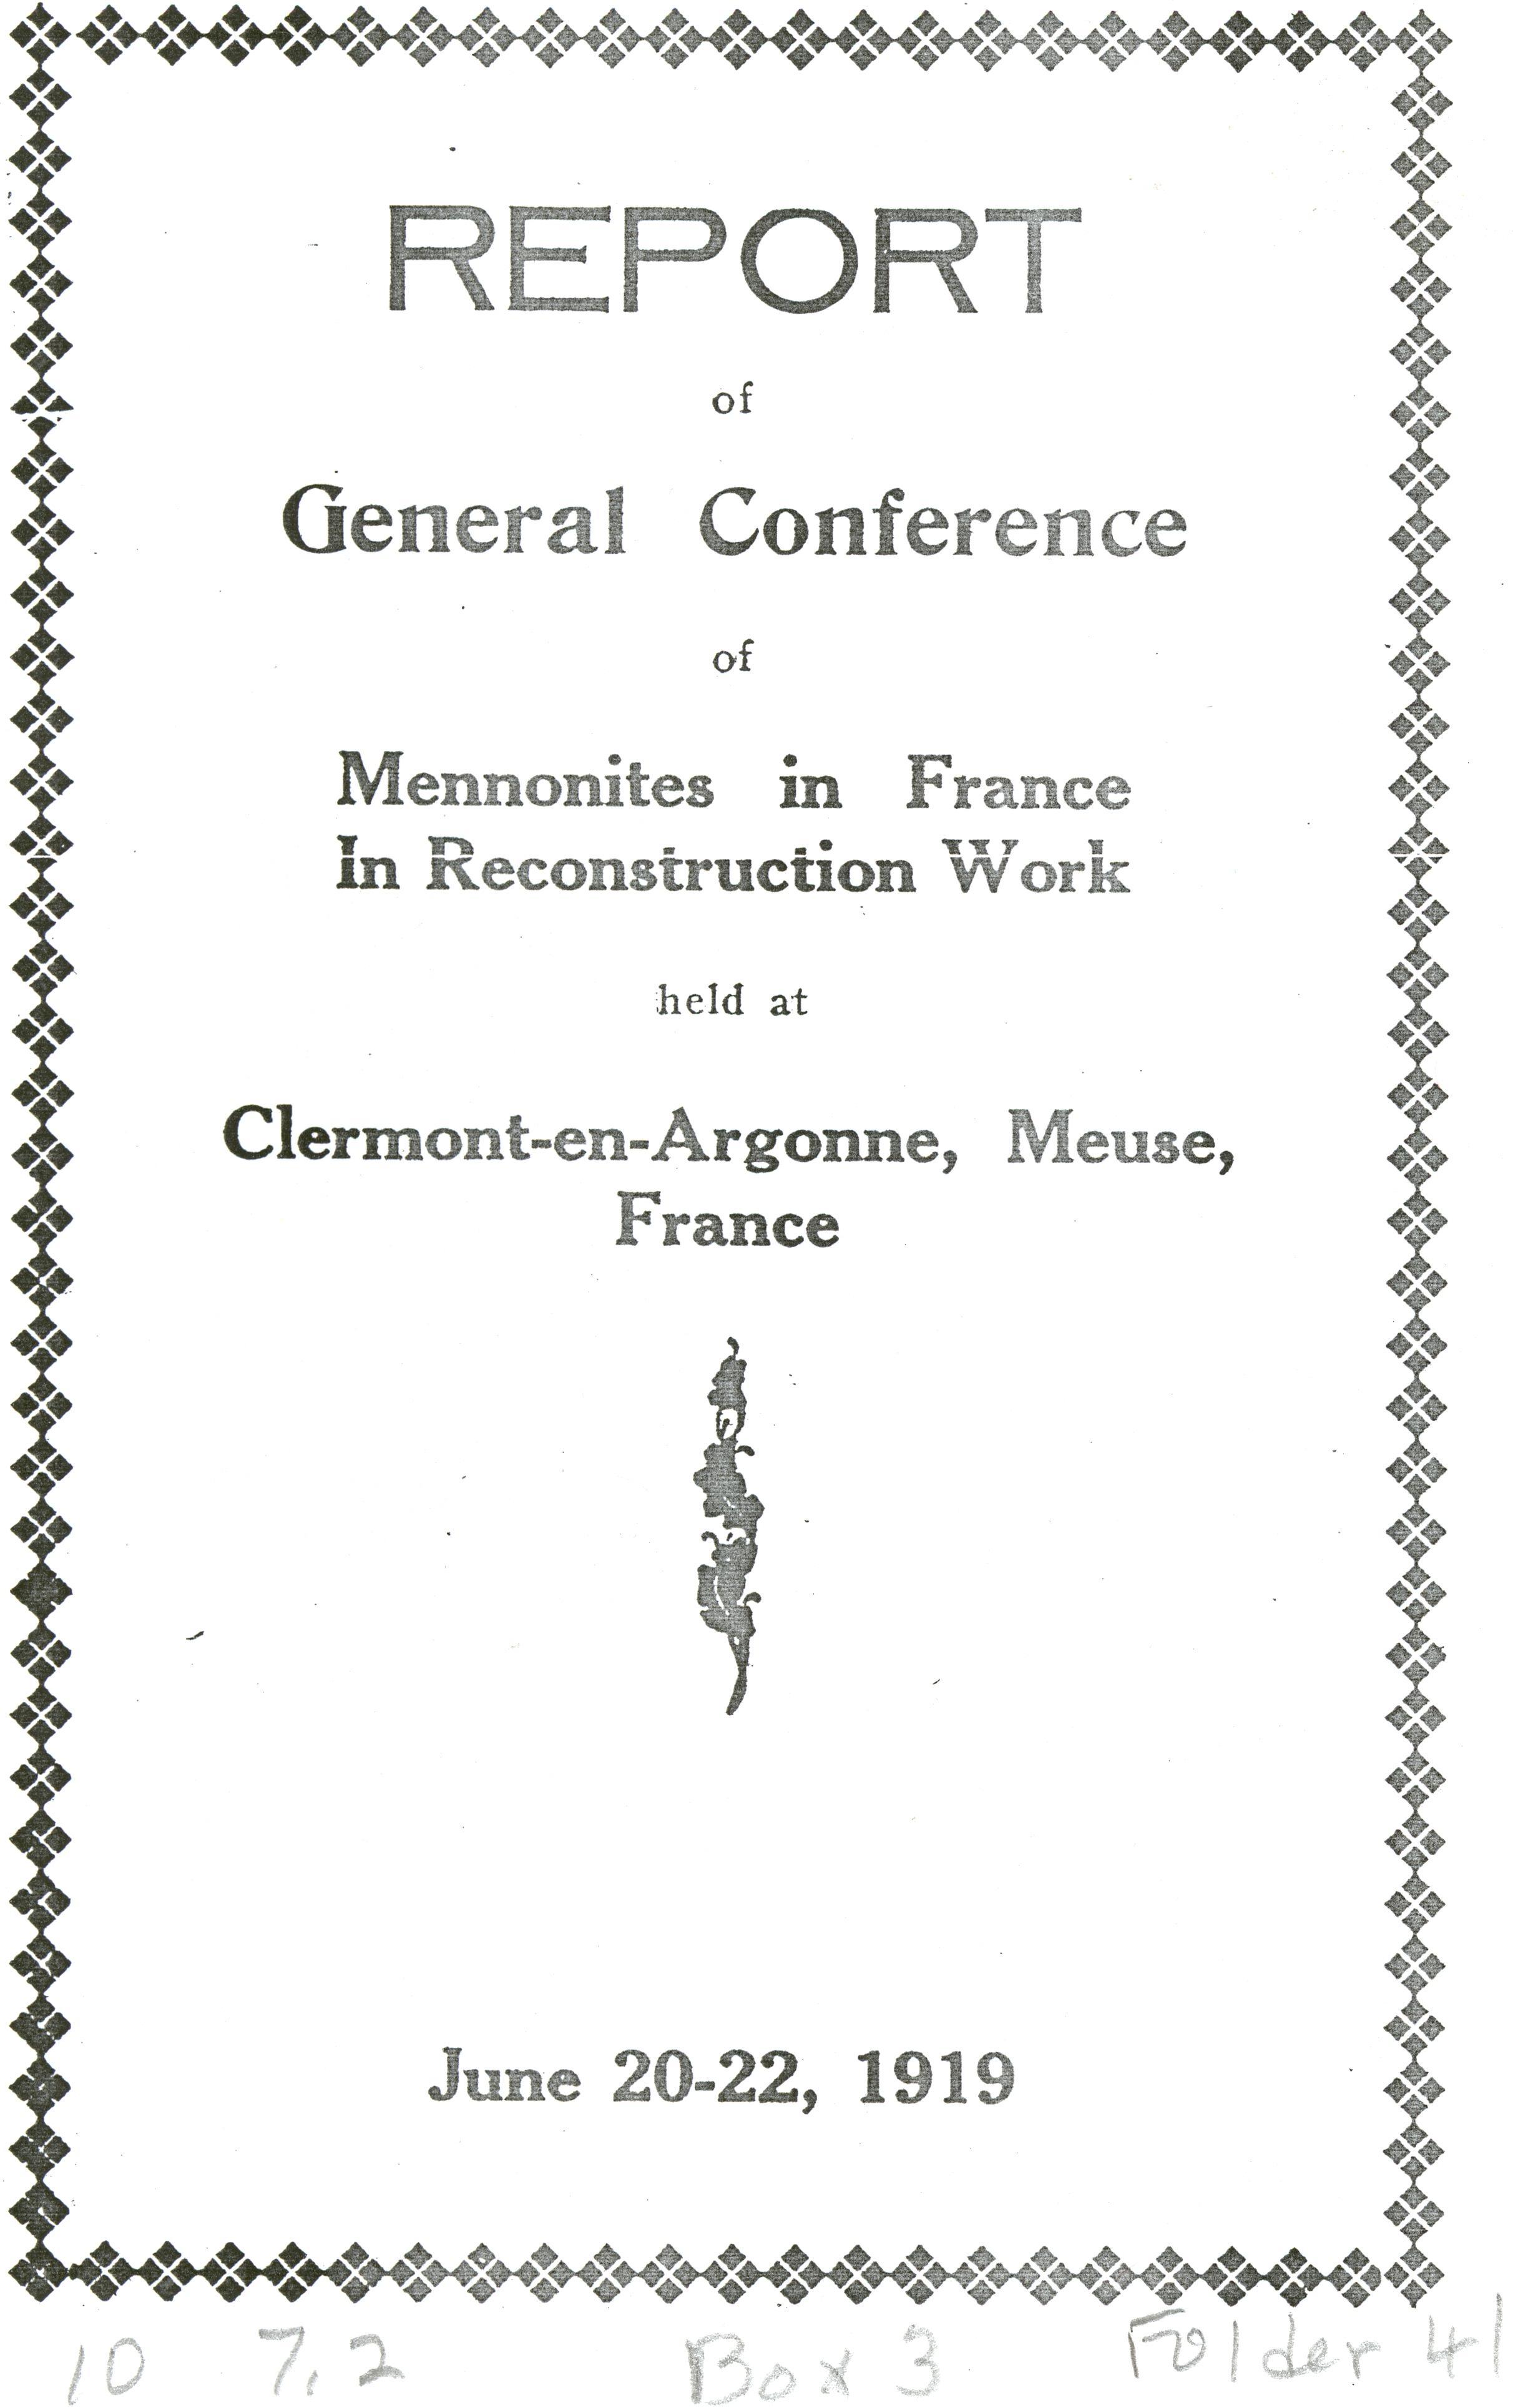 04 Report Mennonites in France page 1.jpg